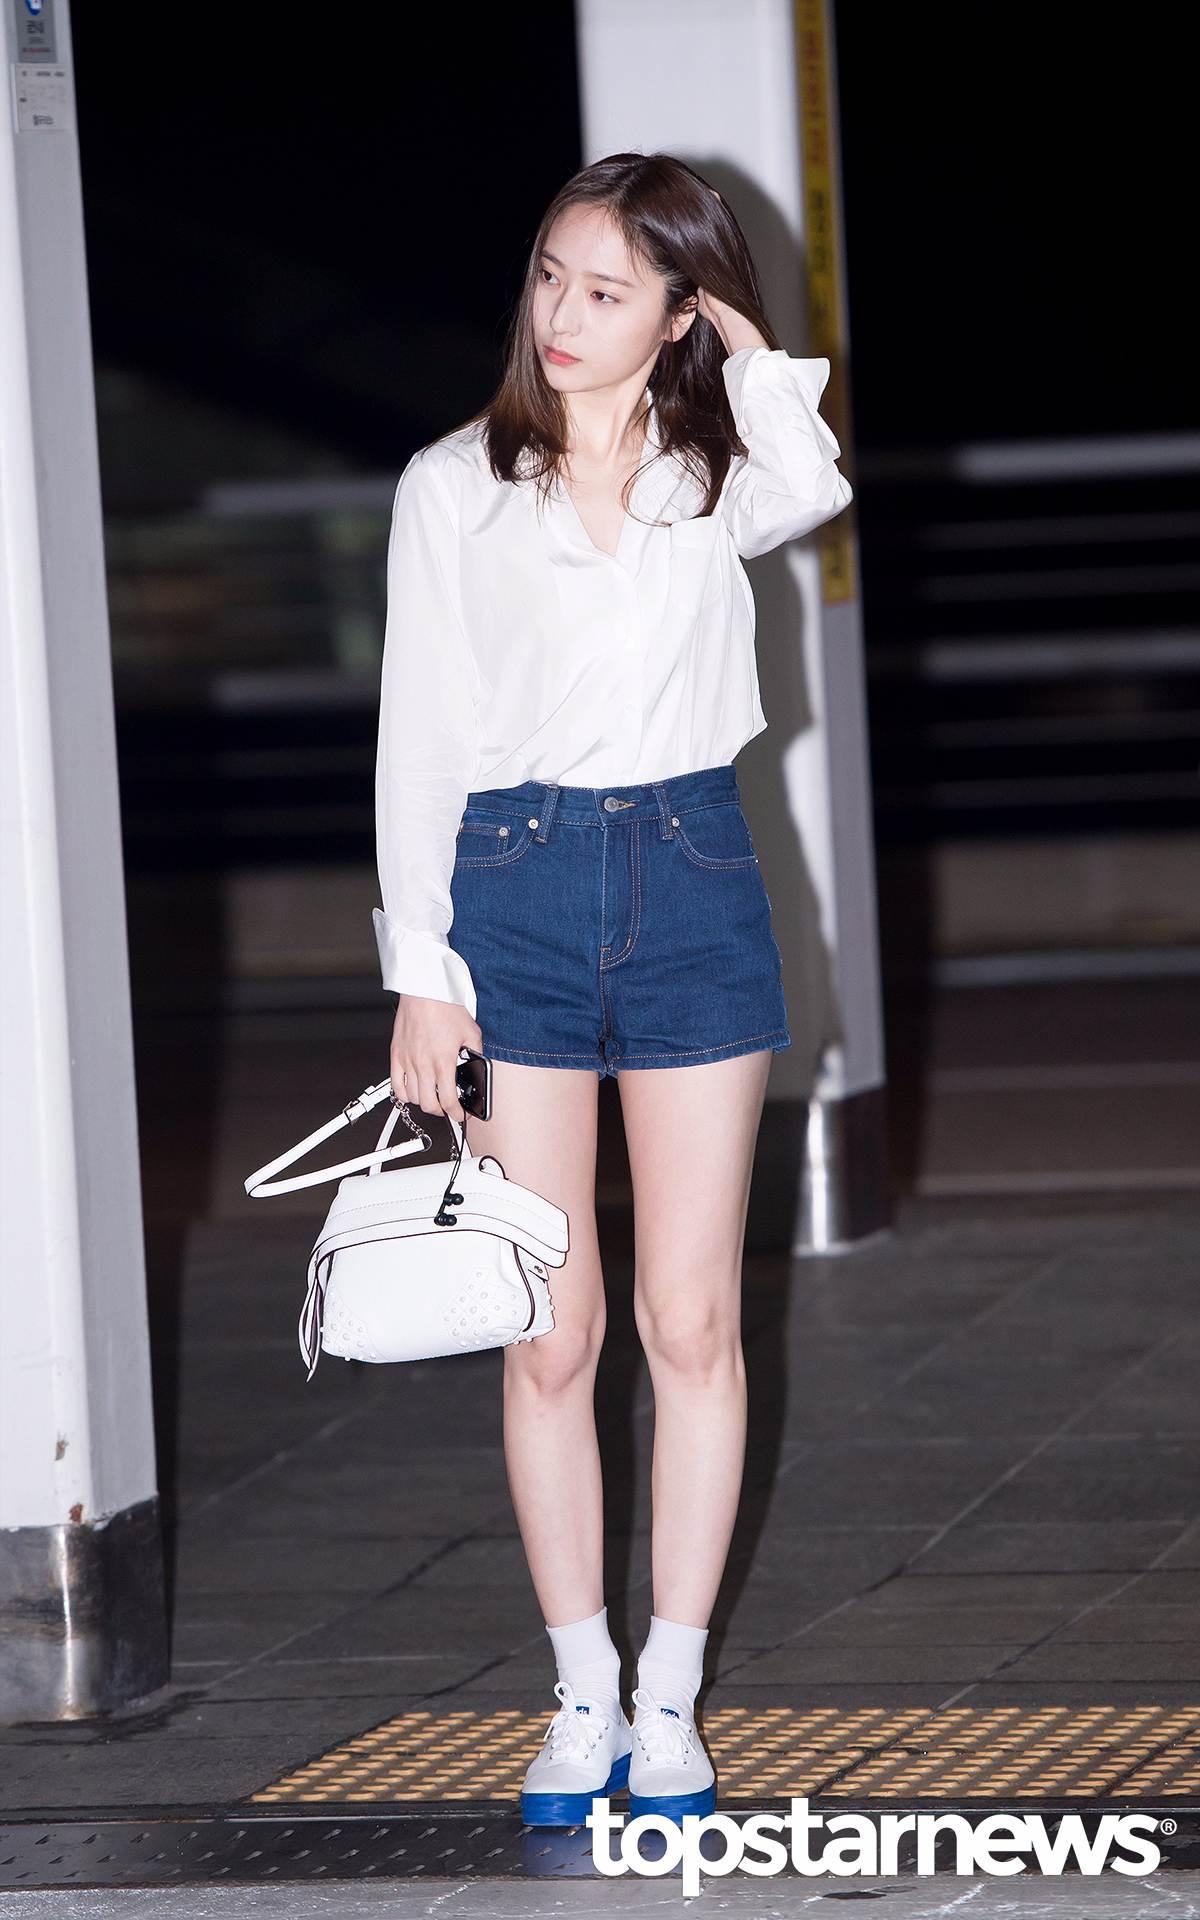 No.1 f(x) Krystal 雖然剛才公佈的前2名都是身高170開始跳!但是要說韓國女生覺得身材最好的明星,還是在類似排名中總是能搶進前3的Krystal莫屬!